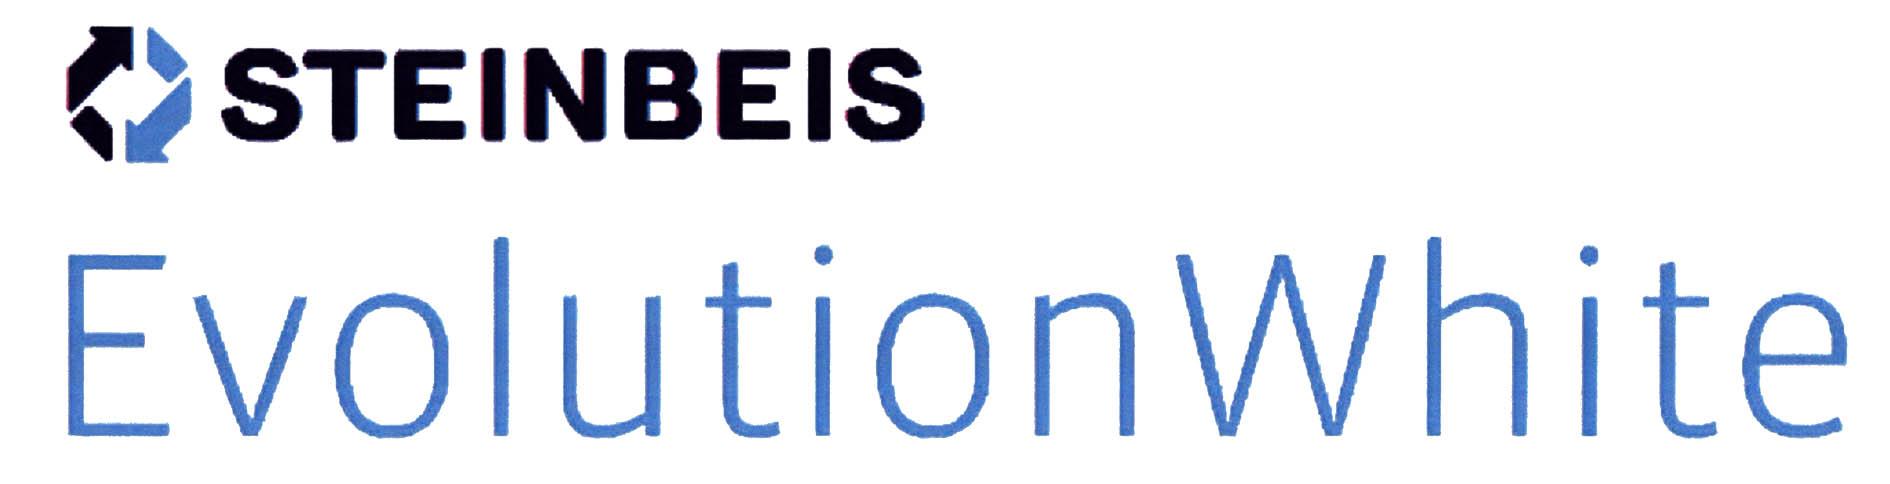 STEINBEIS Evolution White